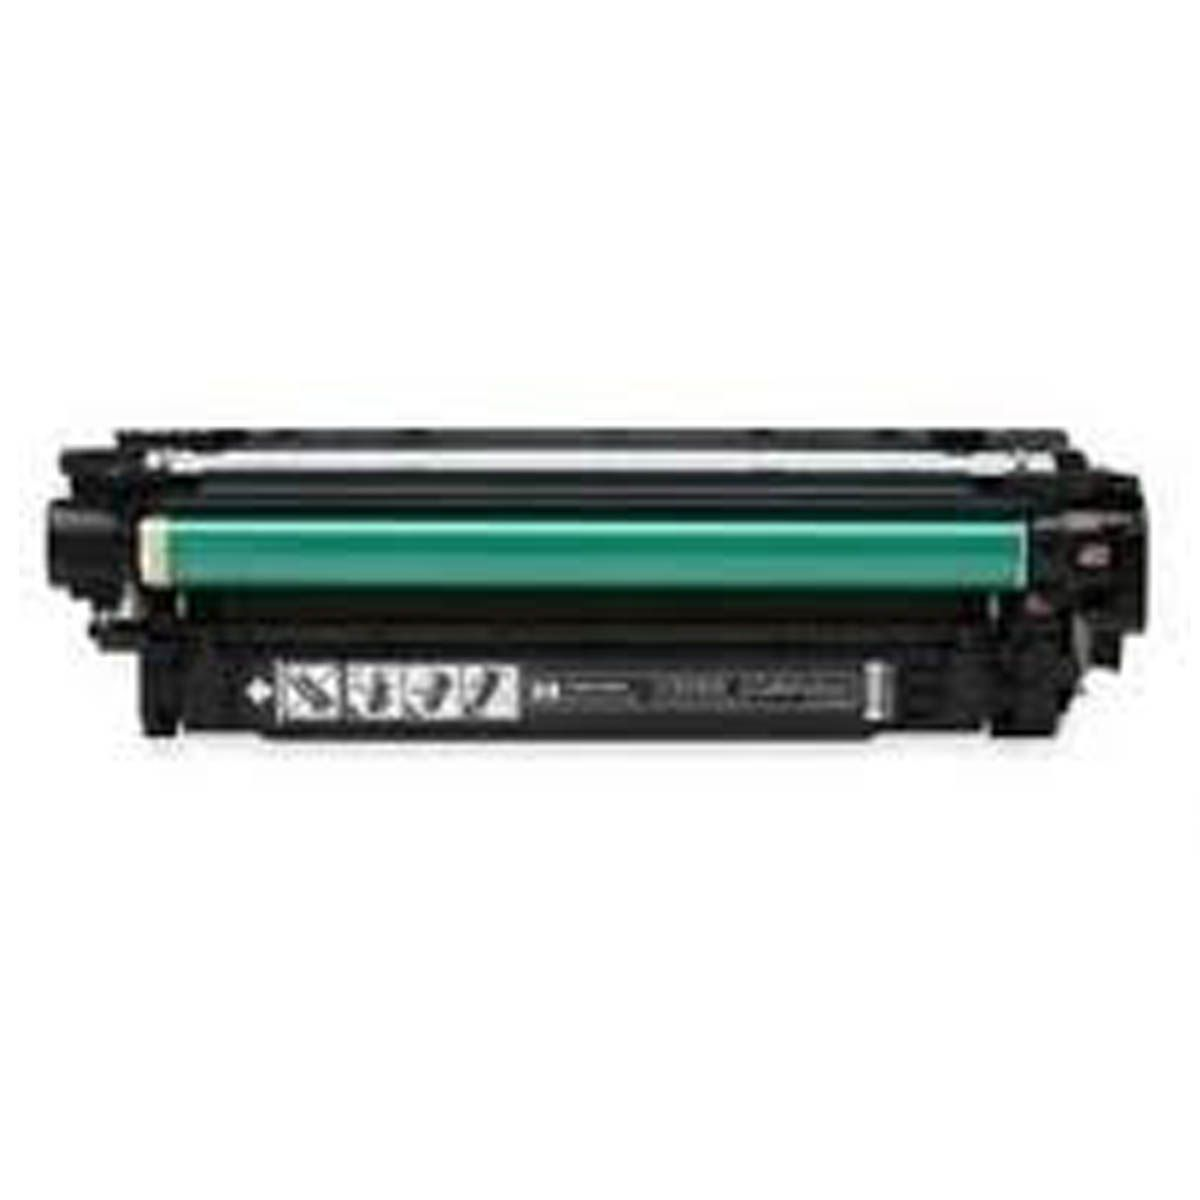 Toner Compativel com HP CE250A CE250 - 504A - Preto - CM3530 CM3530FS CP3525N CP3525DN - 5K